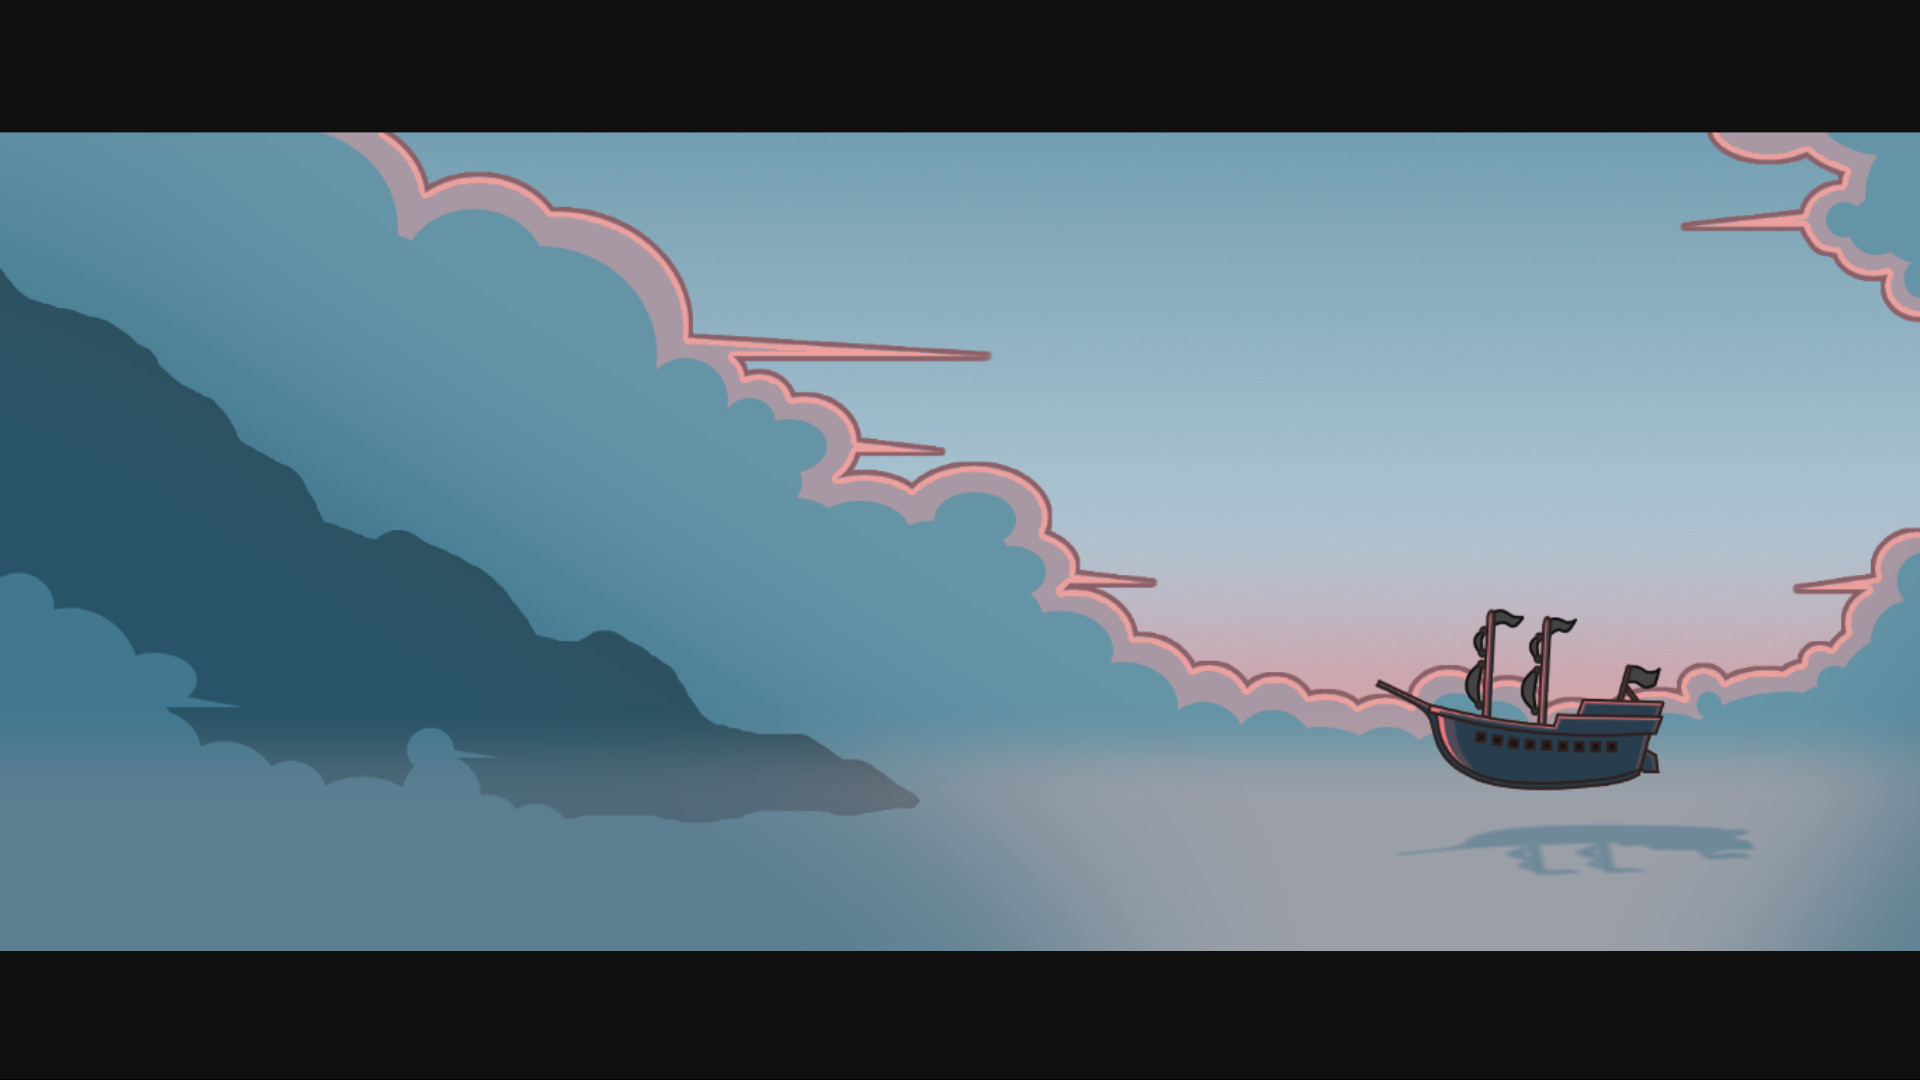 10 Second Ninja X game image